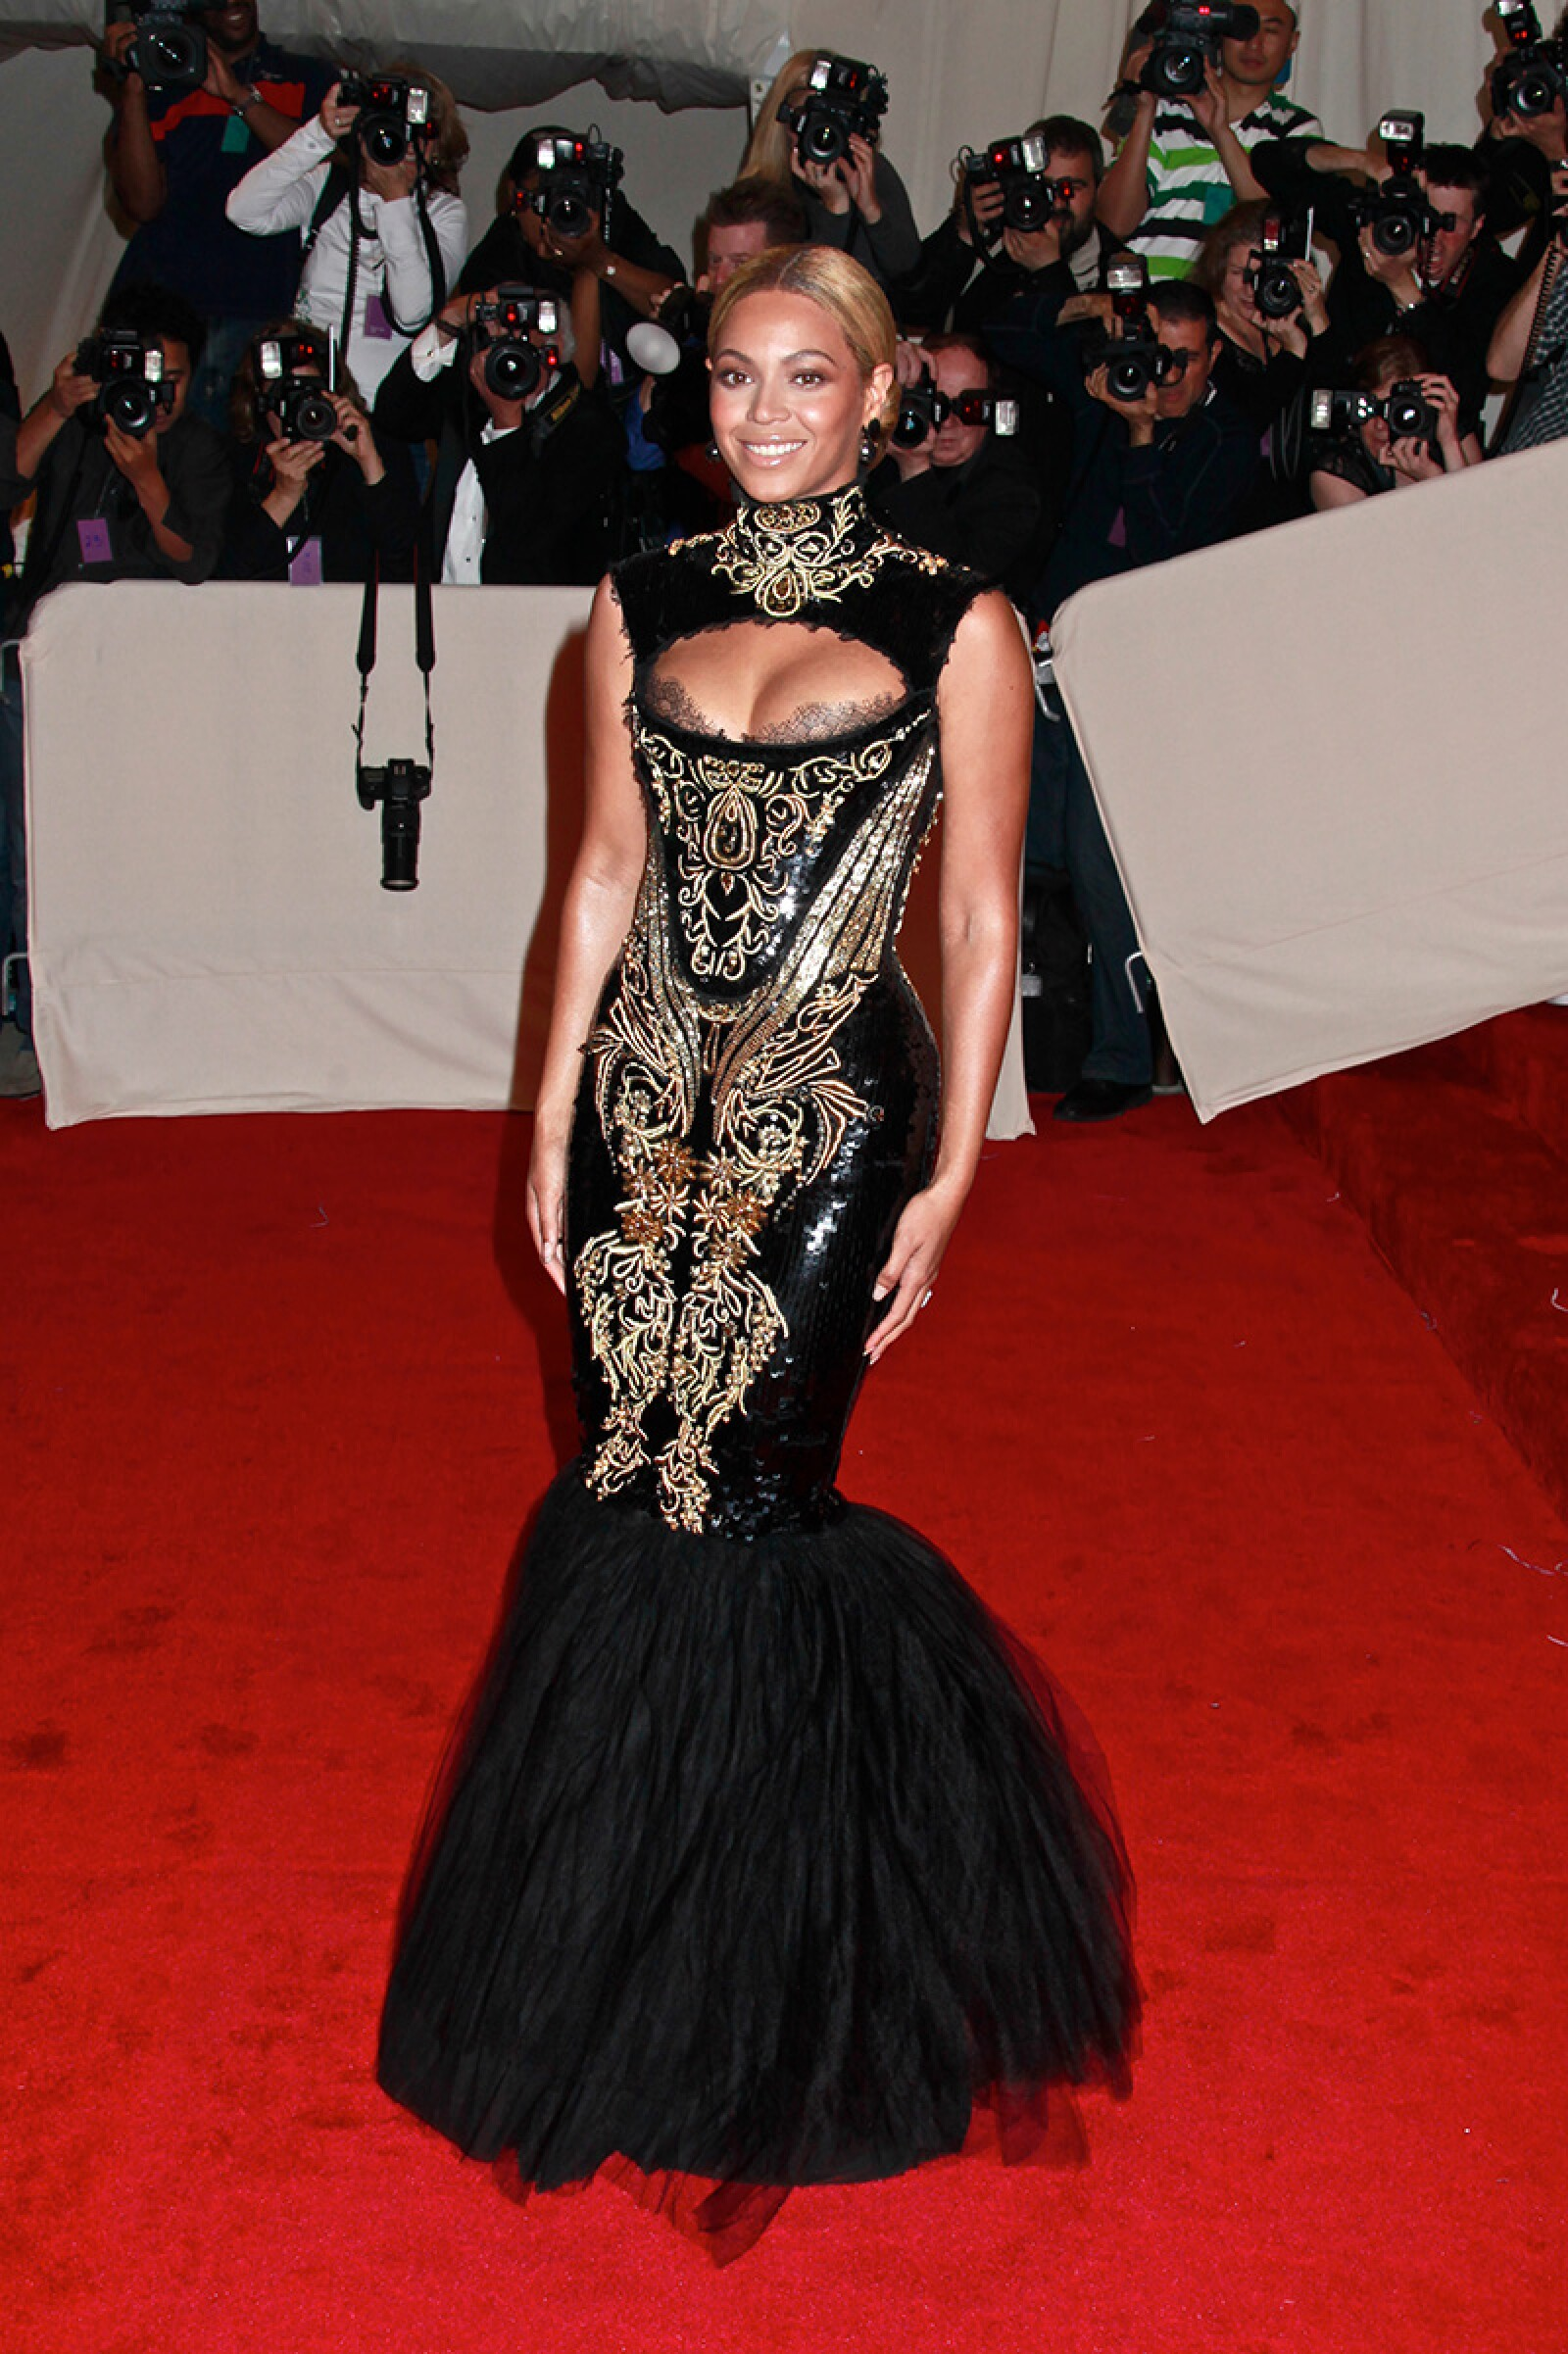 Costume Institute Gala Benefit, Celebrating 'Alexander McQueen: Savage Beauty' at the Metropolitan Museum of Art, New York, America - 02 May 2011